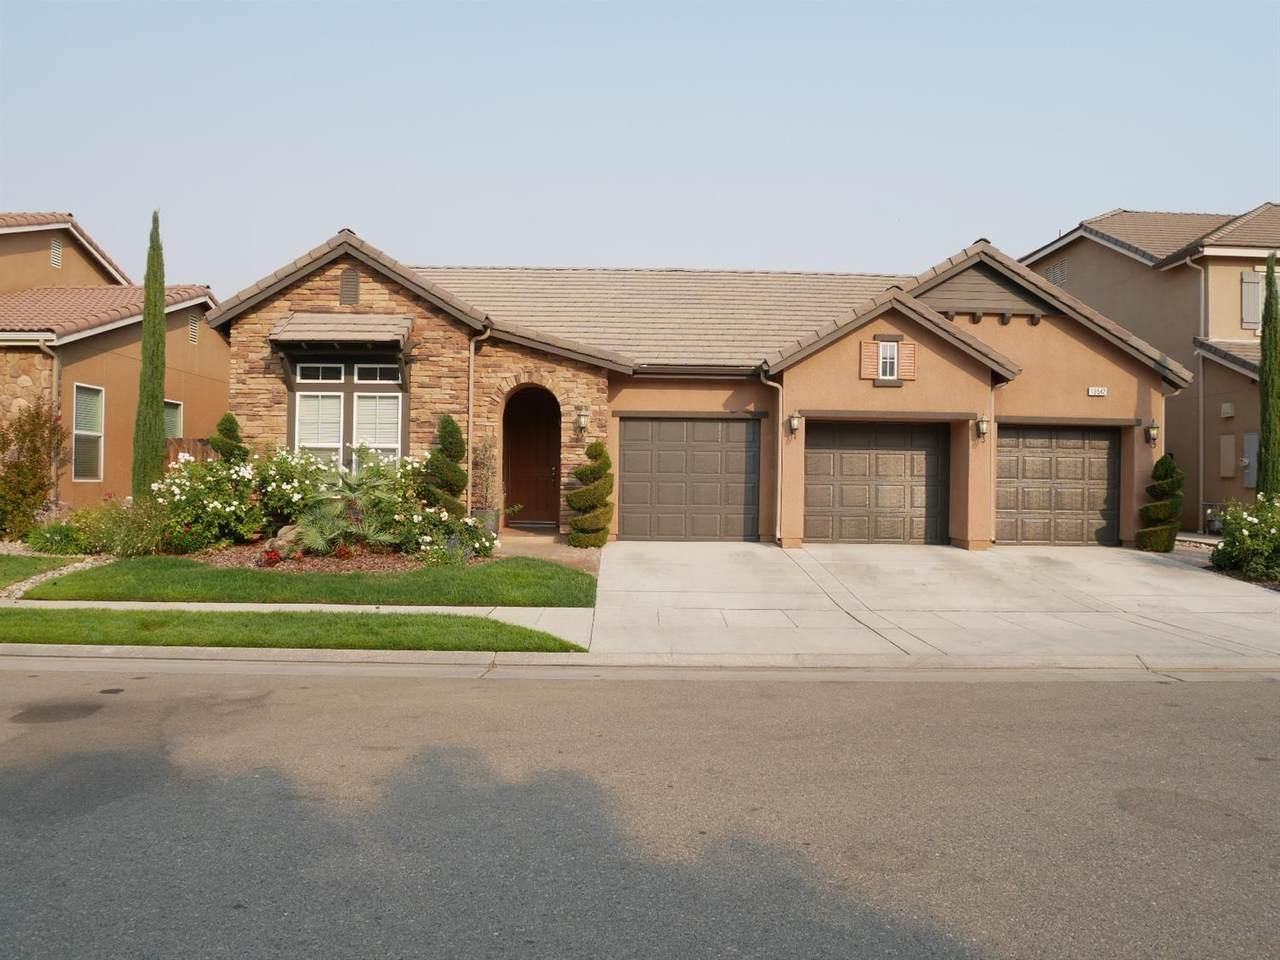 10542 Sierra Vista Avenue - Photo 1